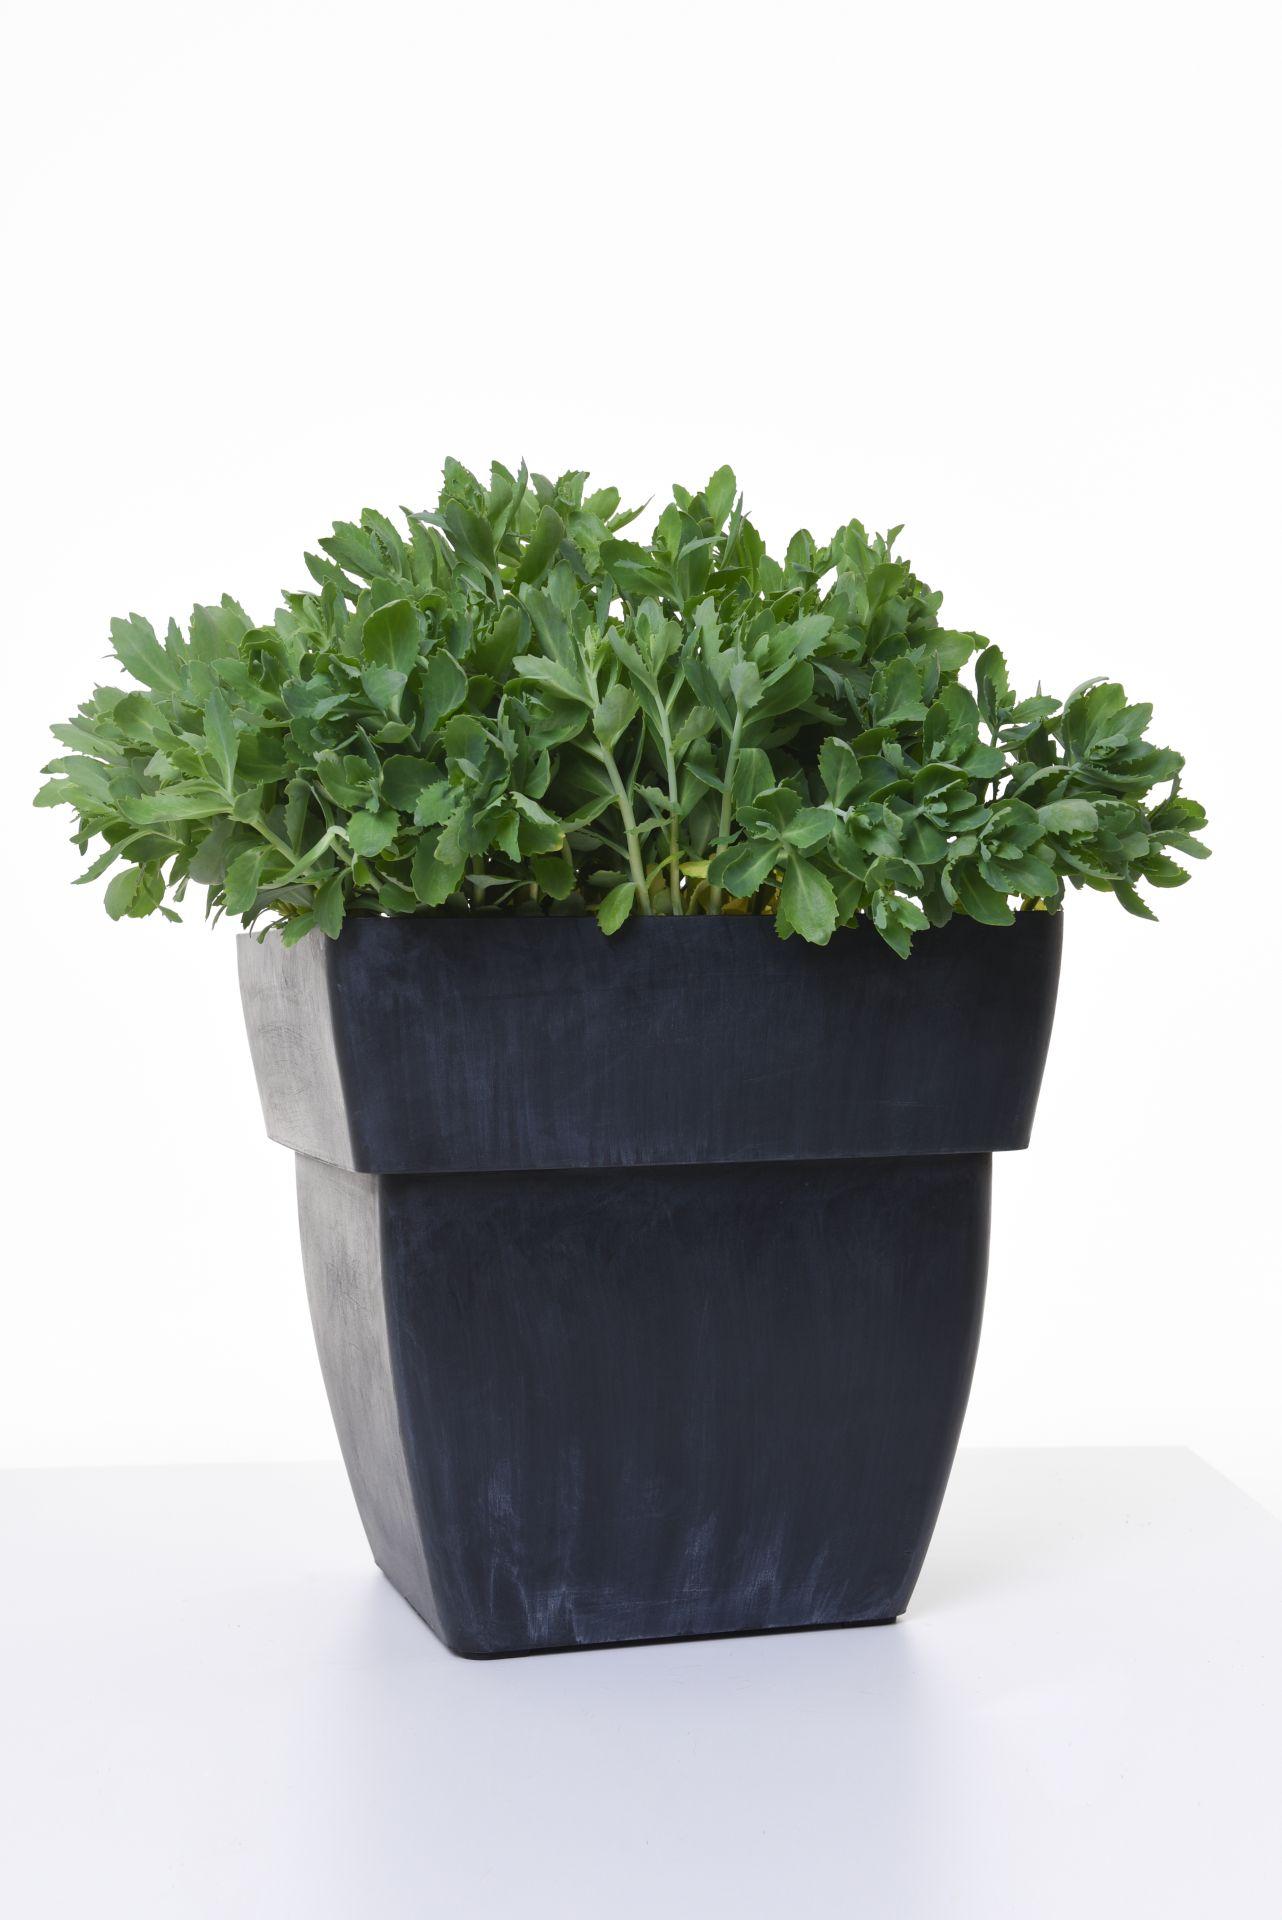 Grosse Pflanzkubel Kunststoff Blumentopf Pflanztopf Kunststoff